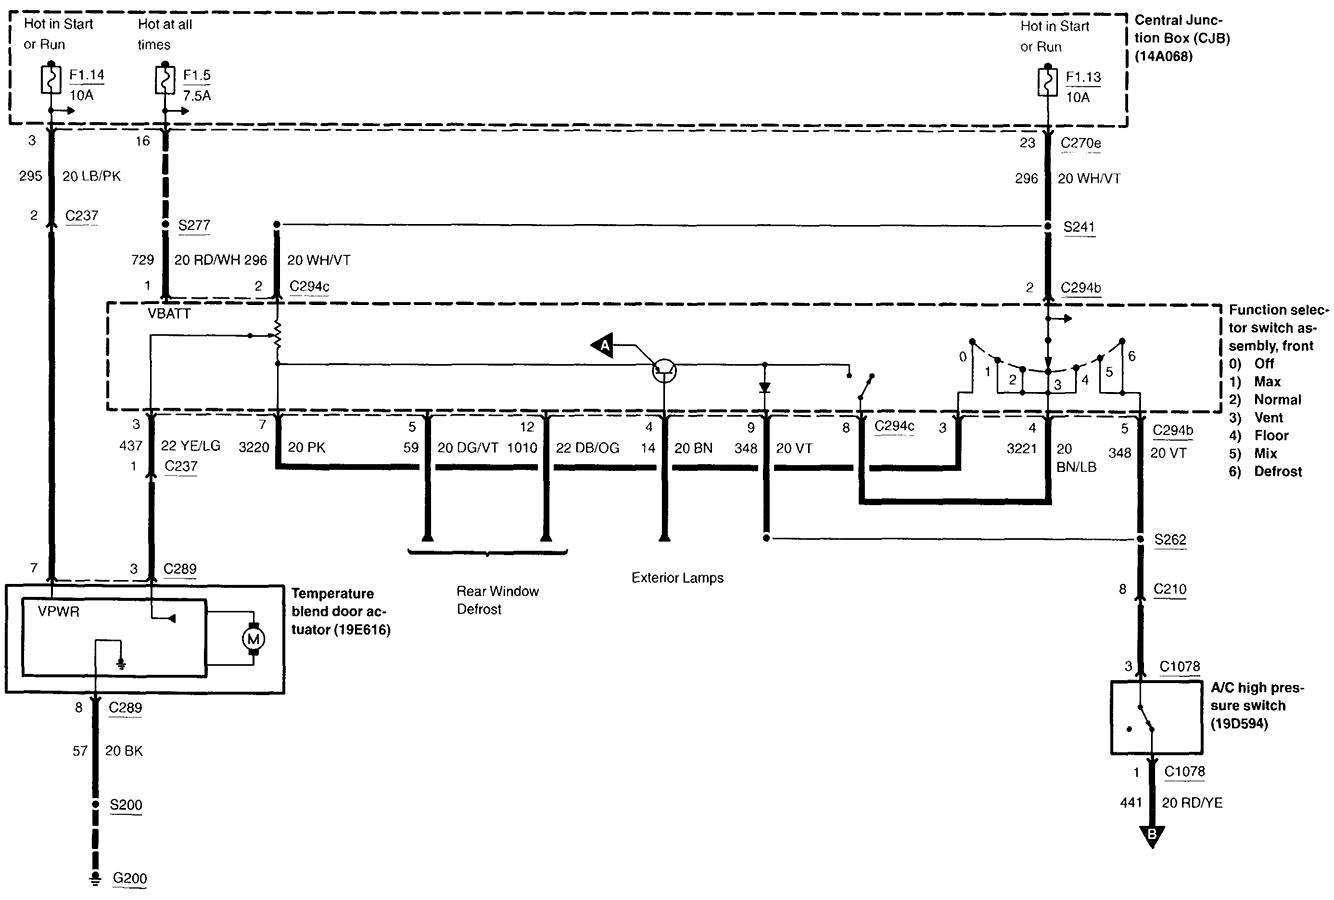 2003 Expedition Wiring Schematic Wiring Diagram Report1 Report1 Maceratadoc It